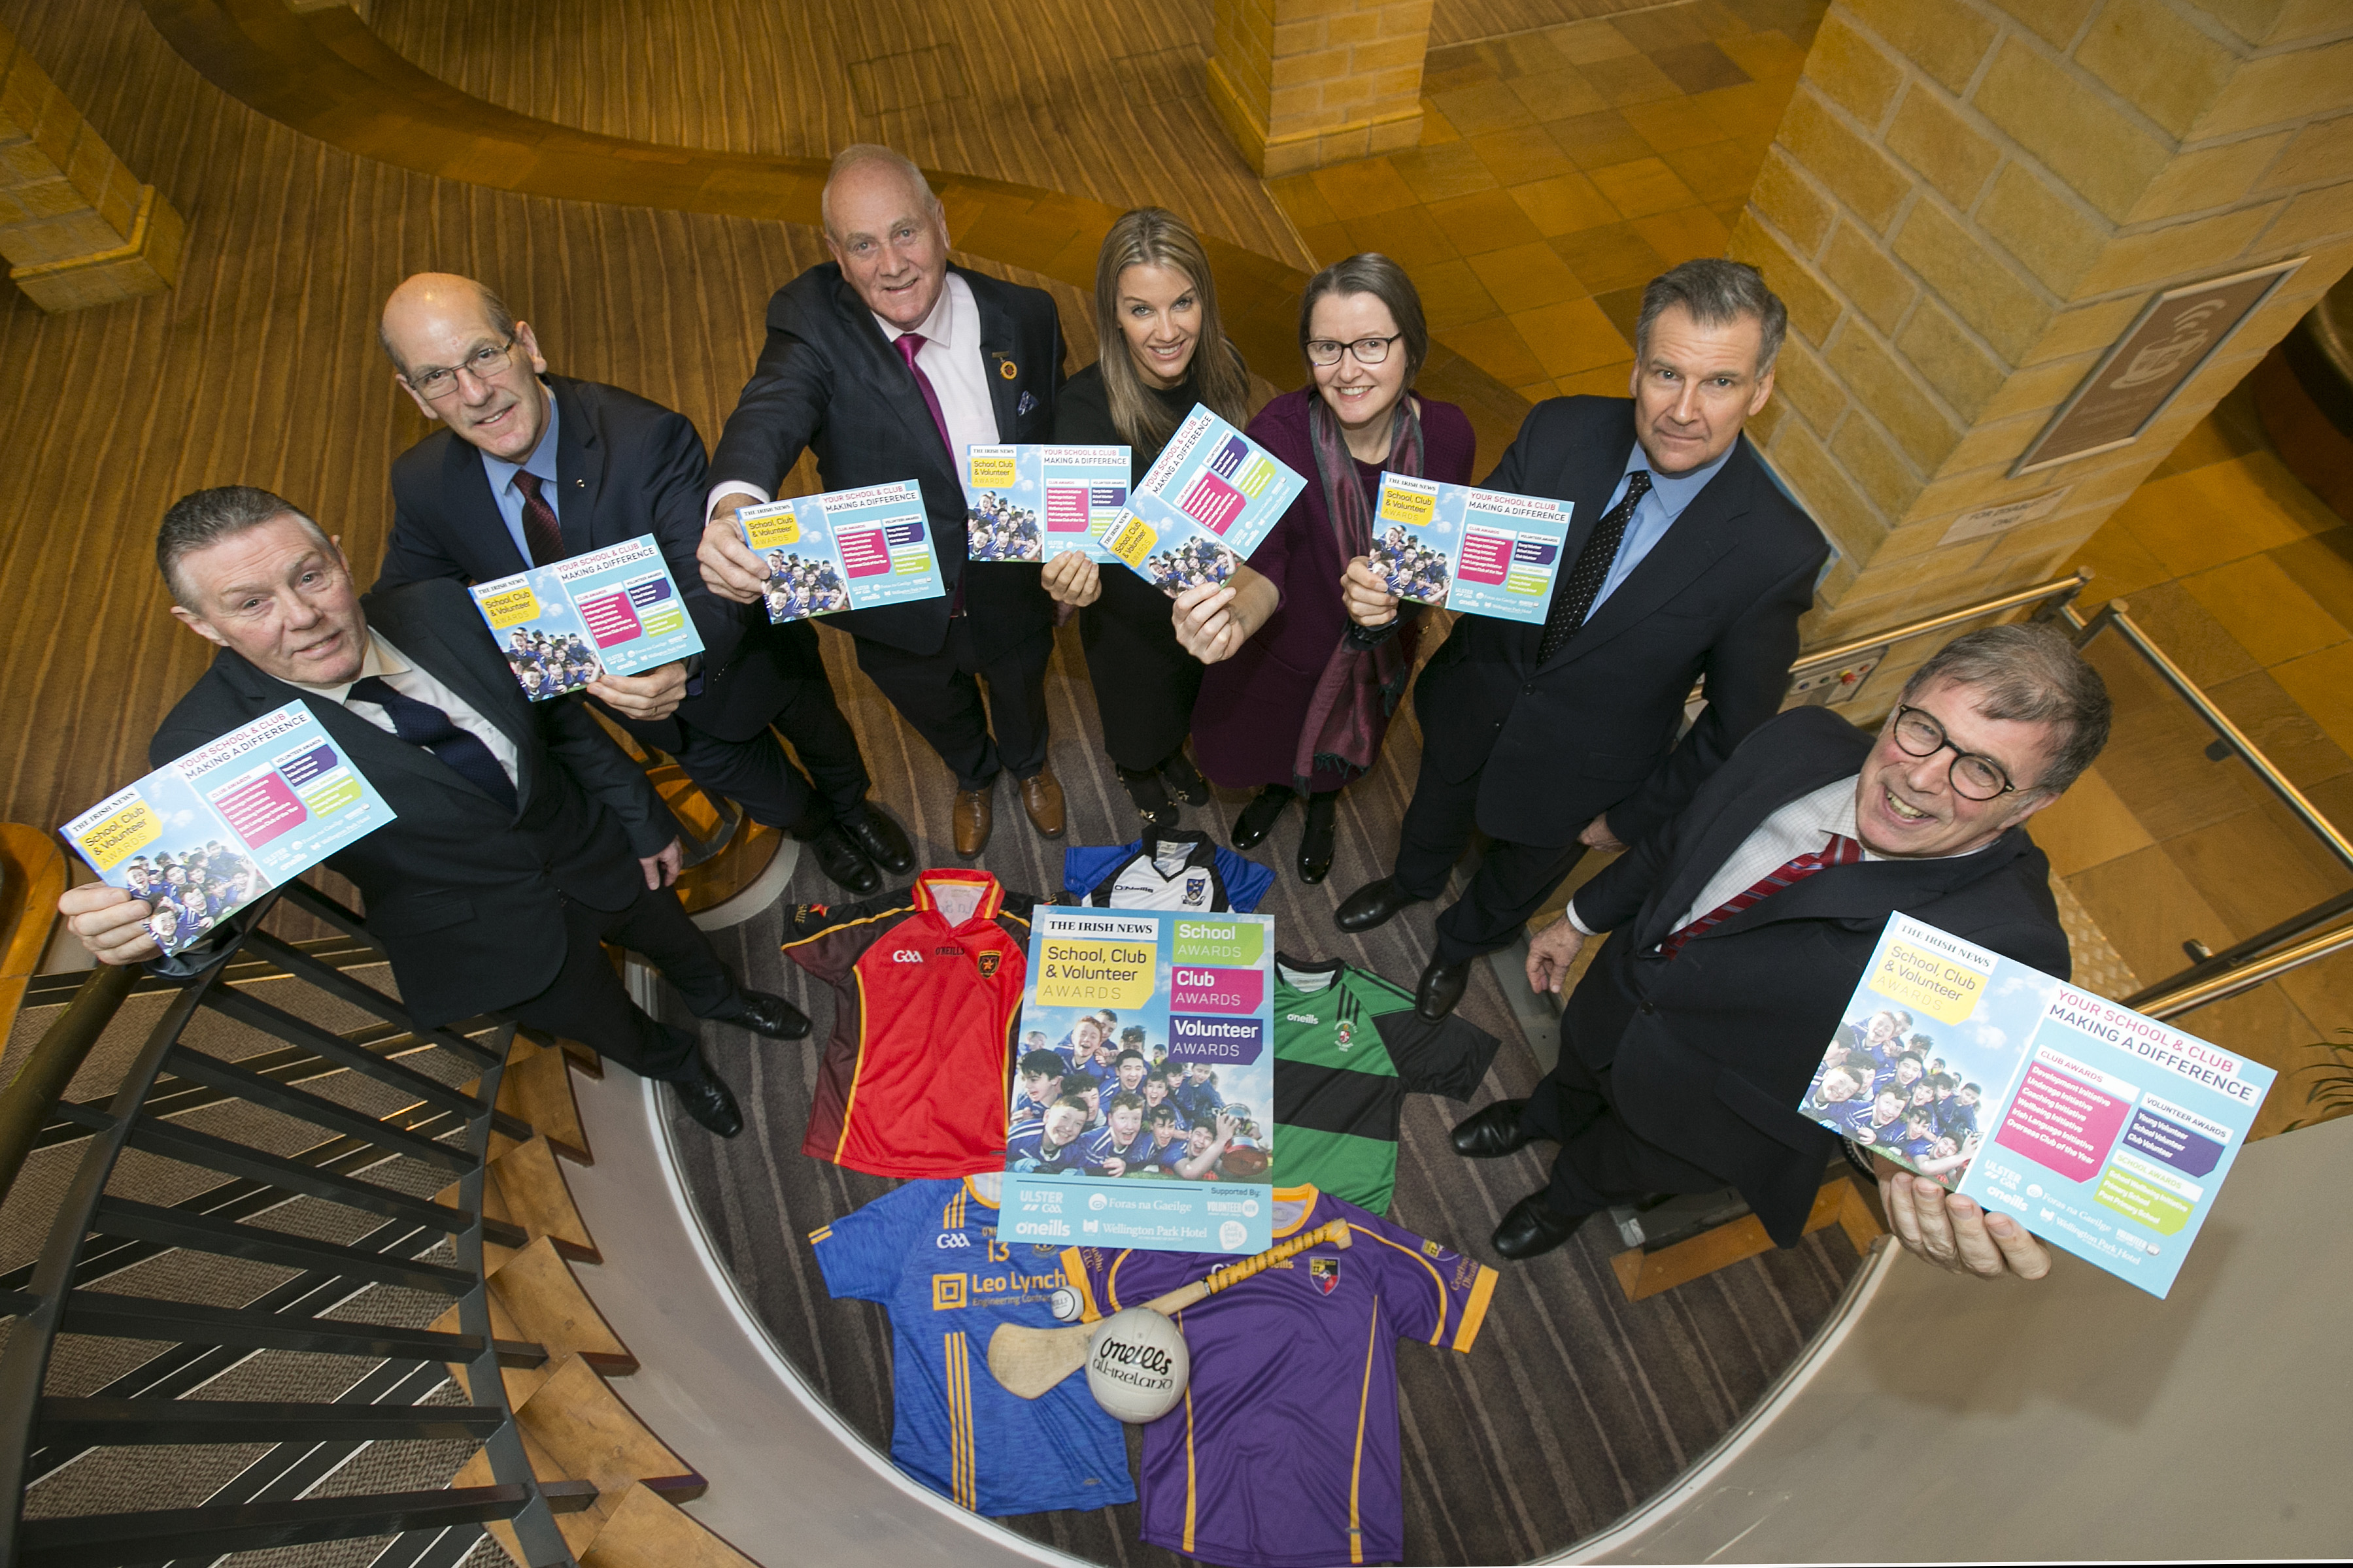 Irish News launch School, Club and Volunteer Awards